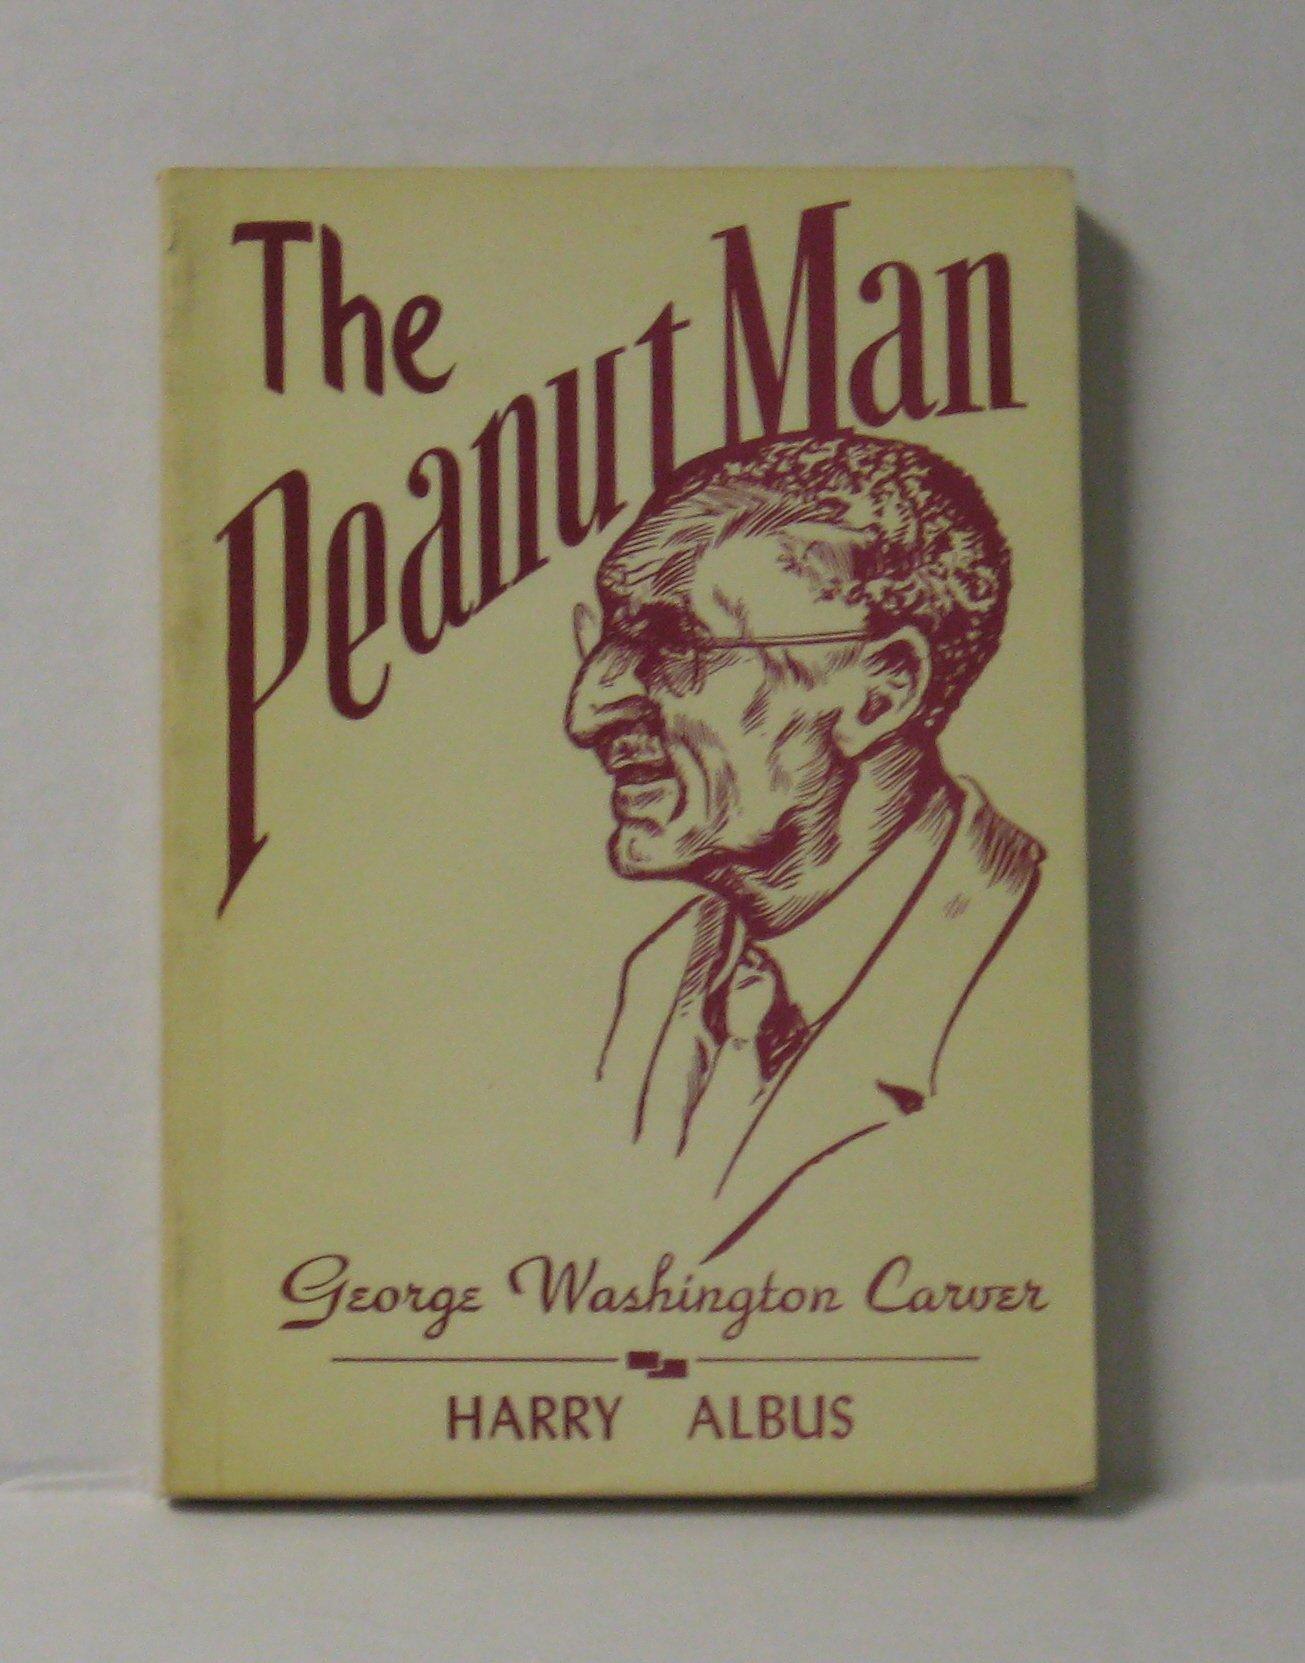 George washington carver crafts - The Peanut Man George Washington Carver Harry Albus Amazon Com Books